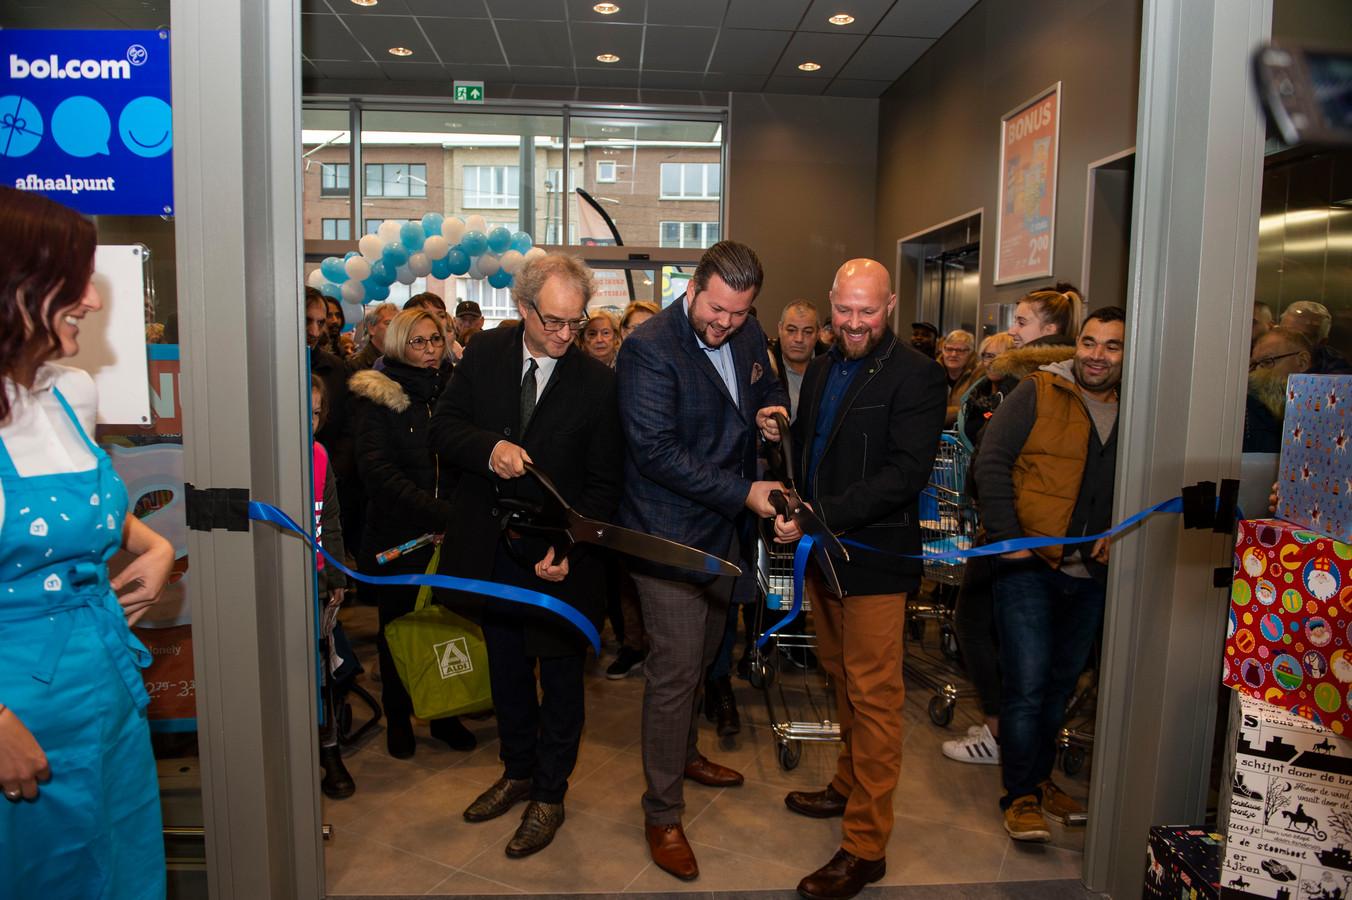 Districtsburgemeester Tjerk Sekeris, Jan en Wim Peeters mochten het lintje doorknippen